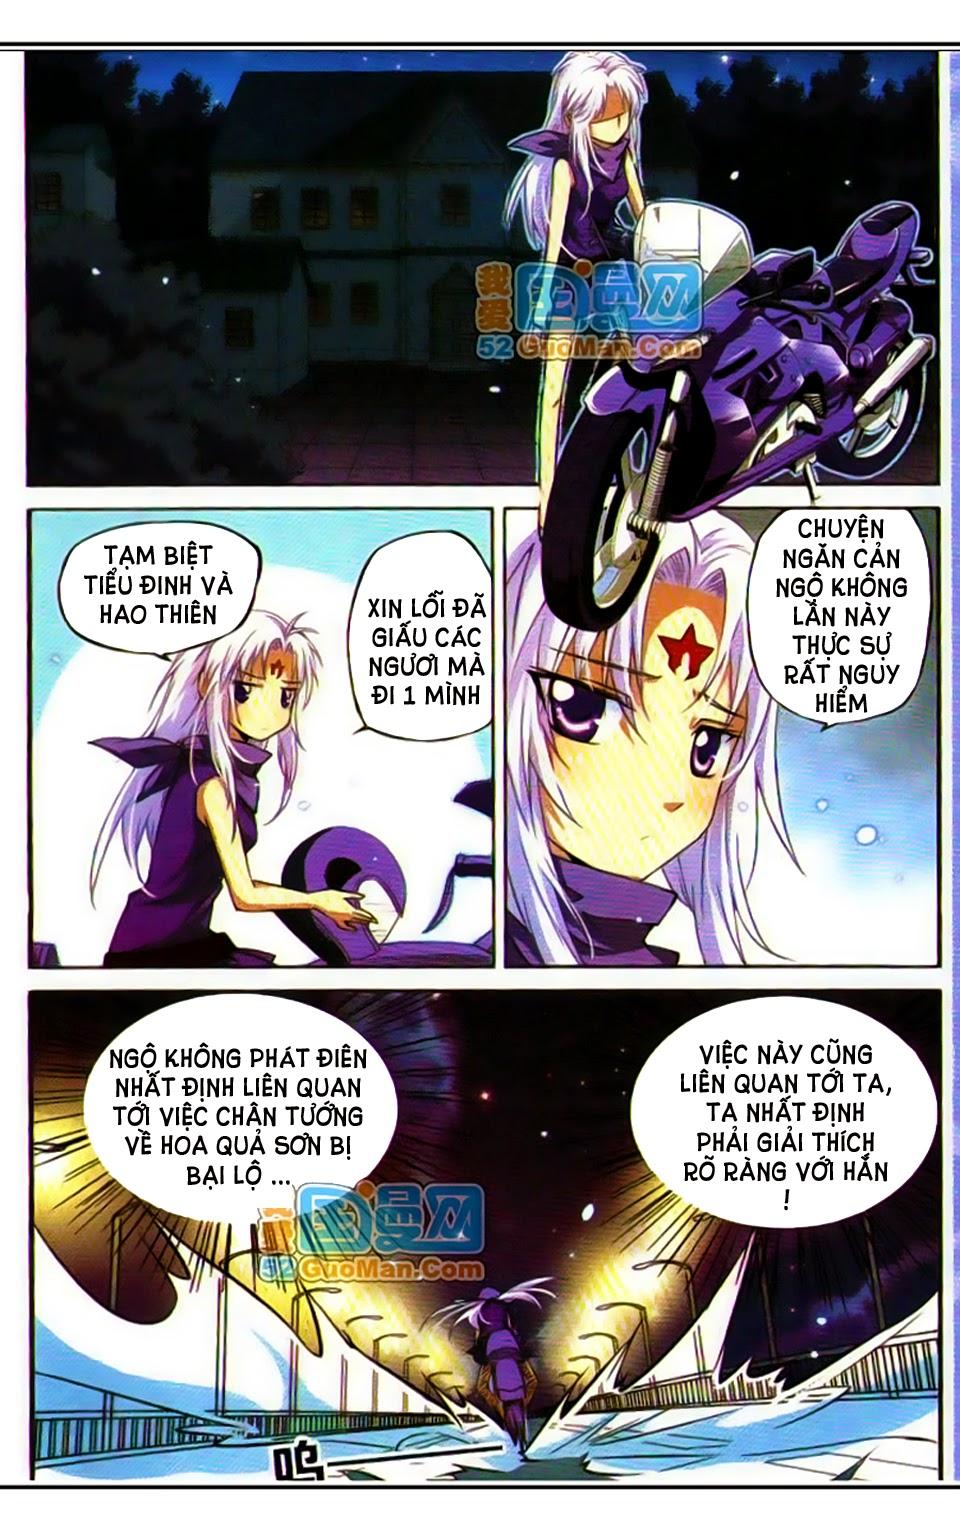 meiepanus.com tam nhan hao thien luc chap 22